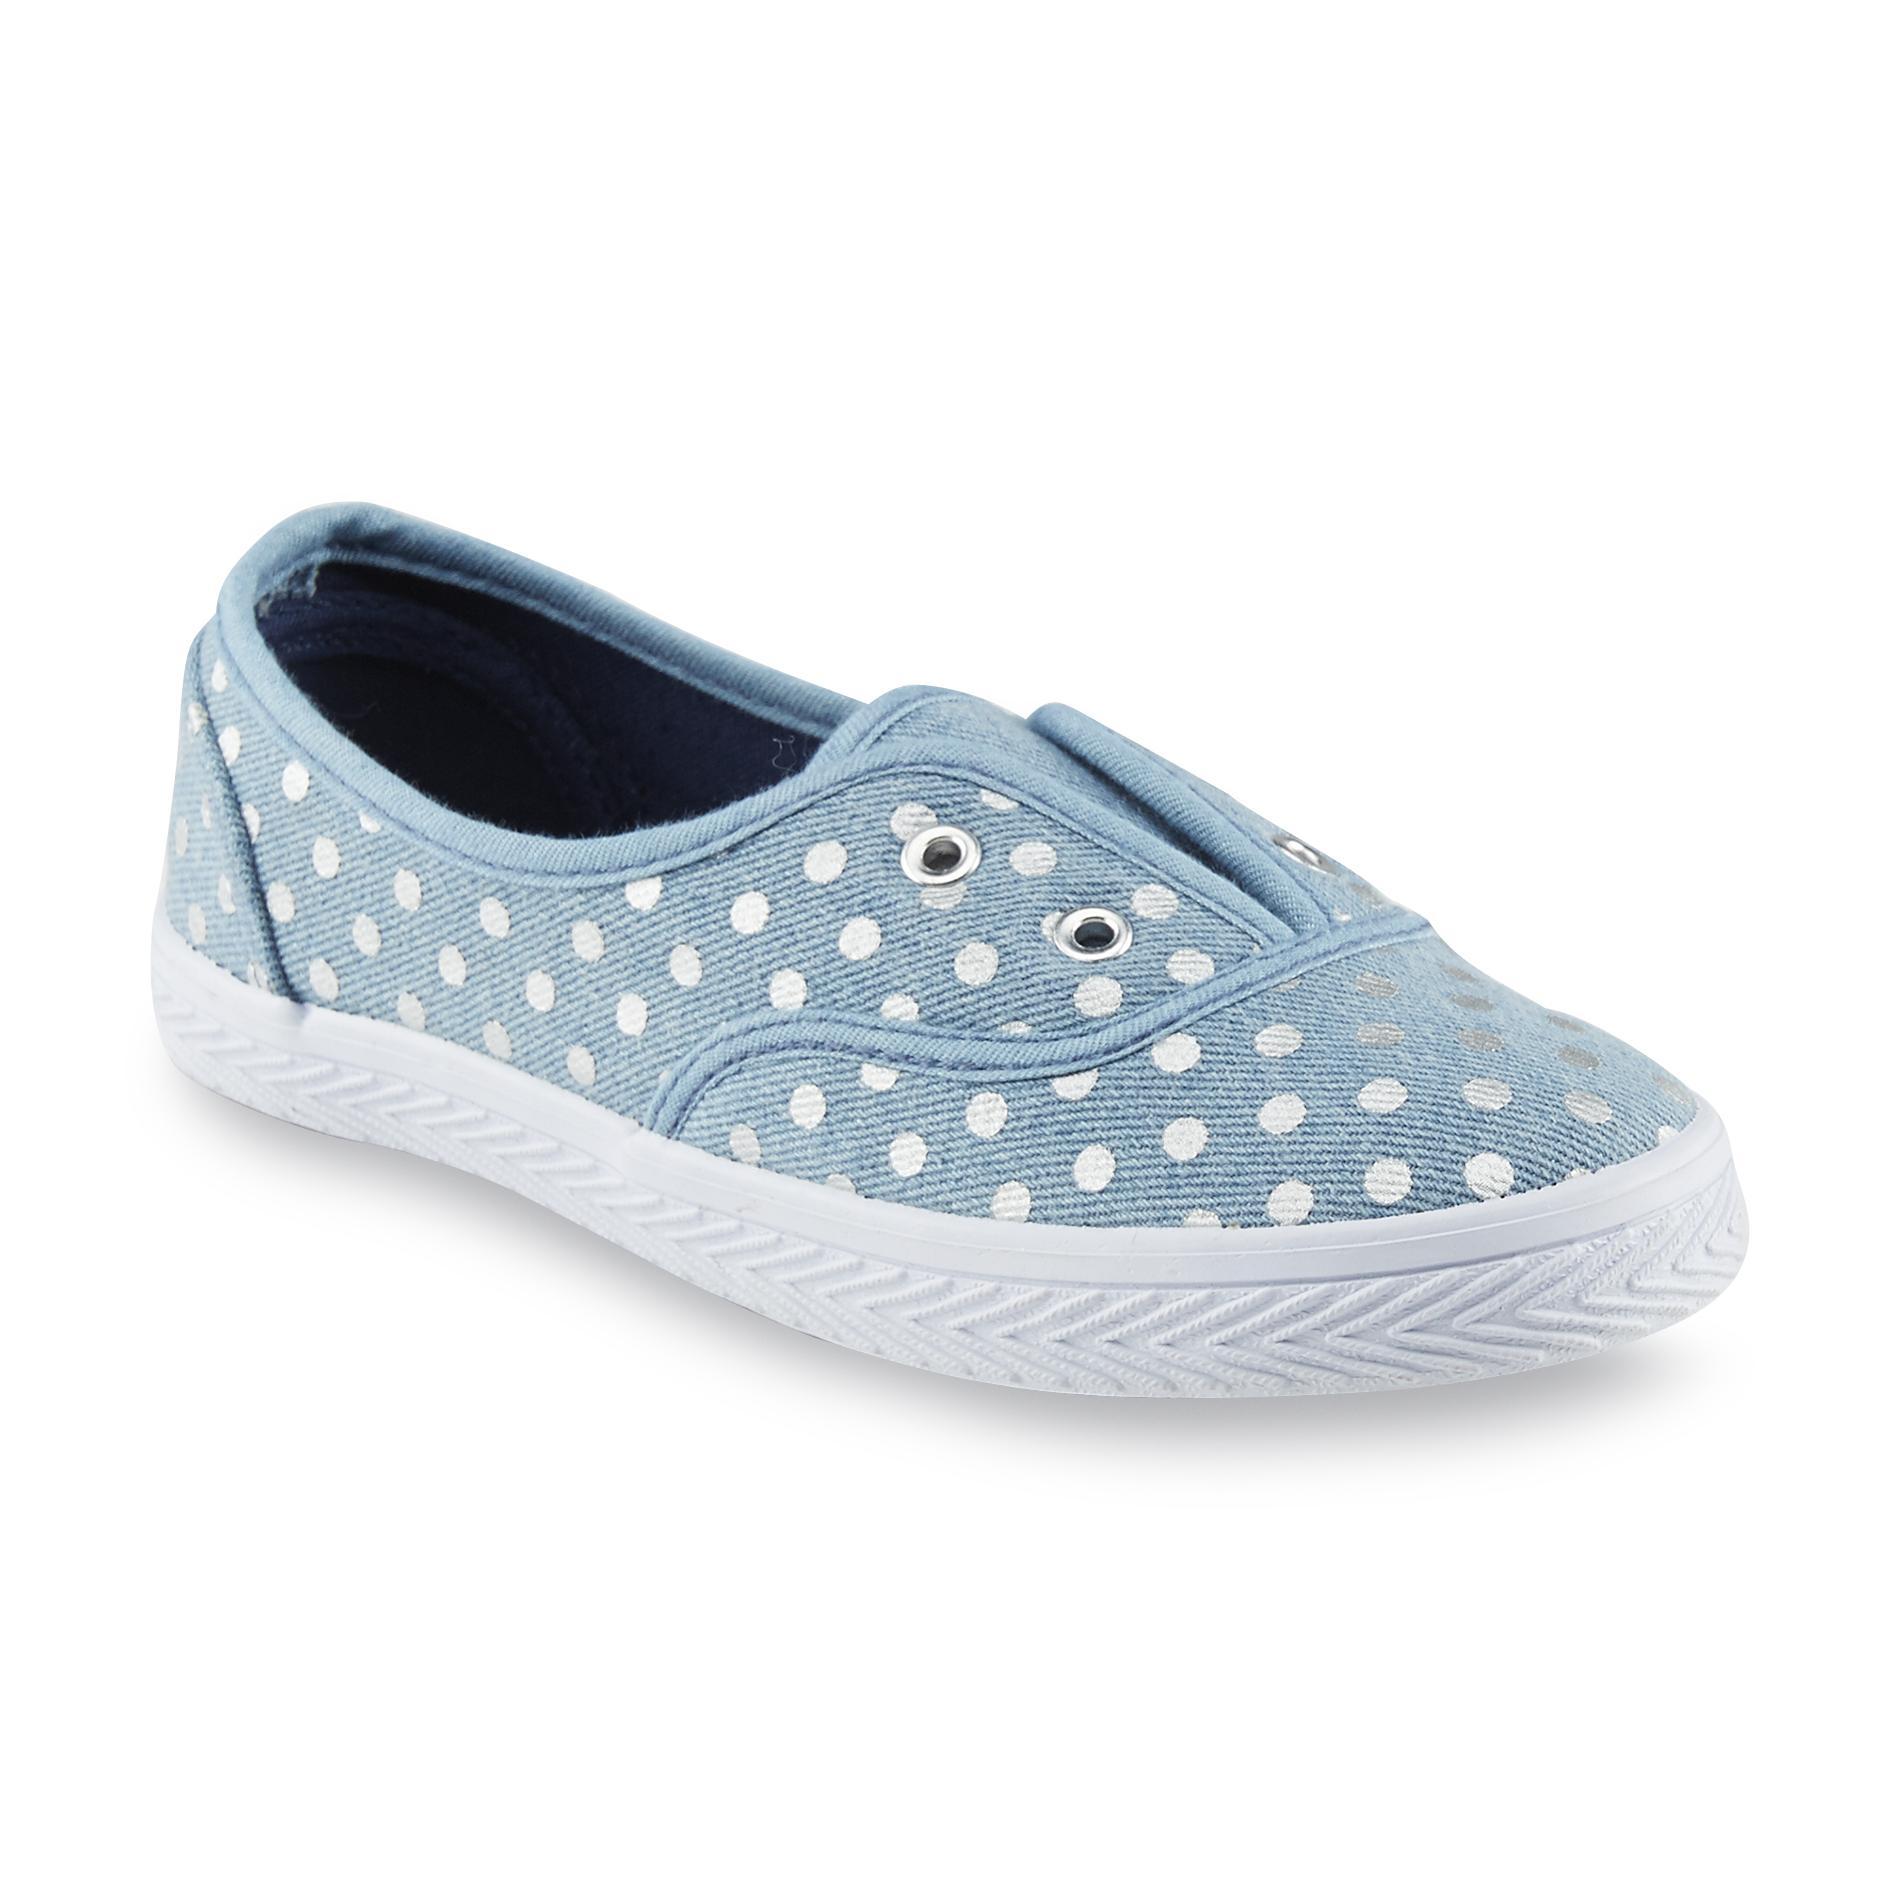 Canyon River Blues Girl's Avery Blue/Polka Dot Slip-On Shoe